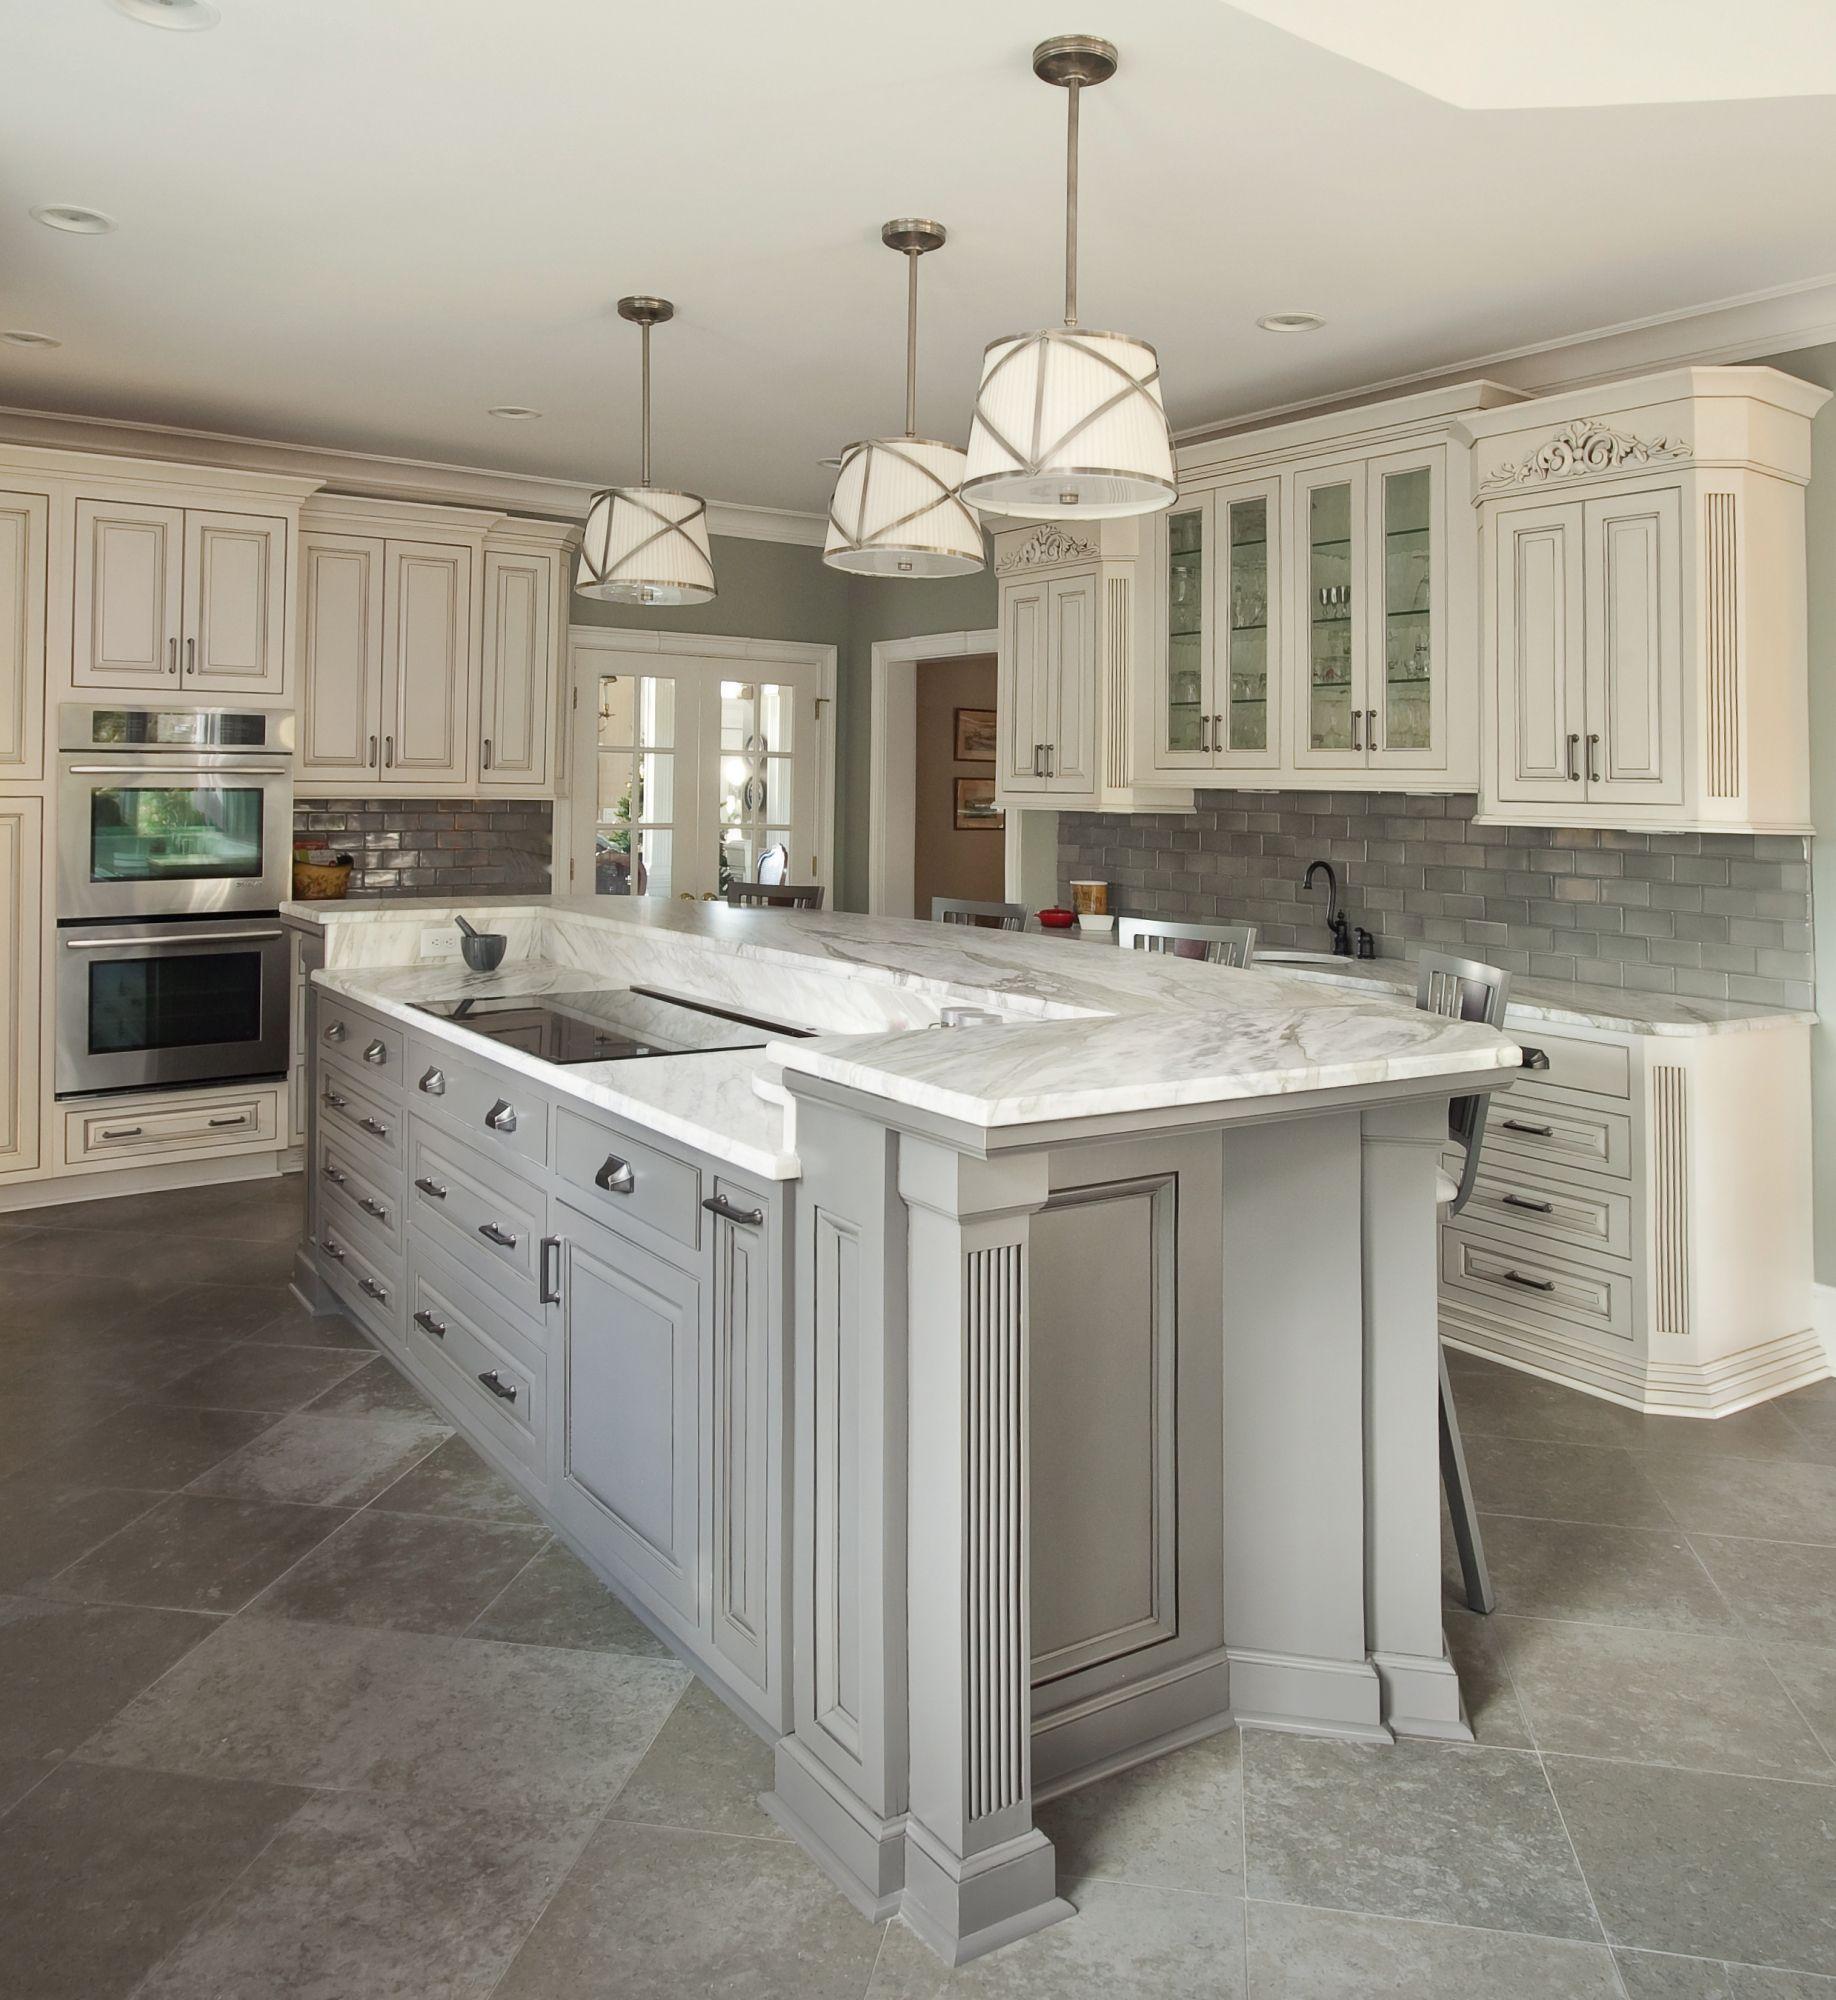 Best Kitchen Gallery: Plantation Kitchen With Grey Island Tile Backsplash Cultivate of Plantation Kitchen Cabinets on rachelxblog.com